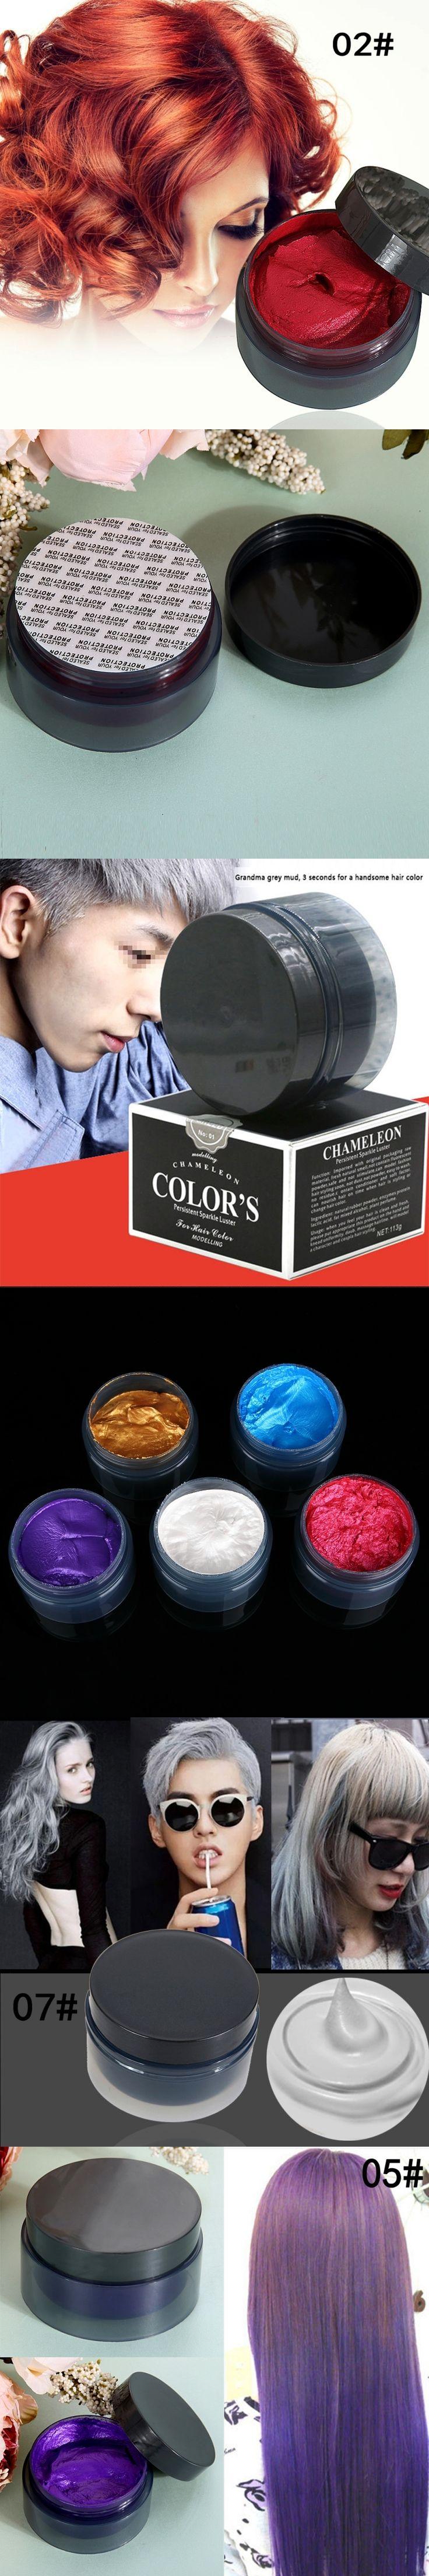 Hair Styling Pomade Women Men Hair Tool Hair Modeling Temporary Hair Dye Cream Wax Mud Cream